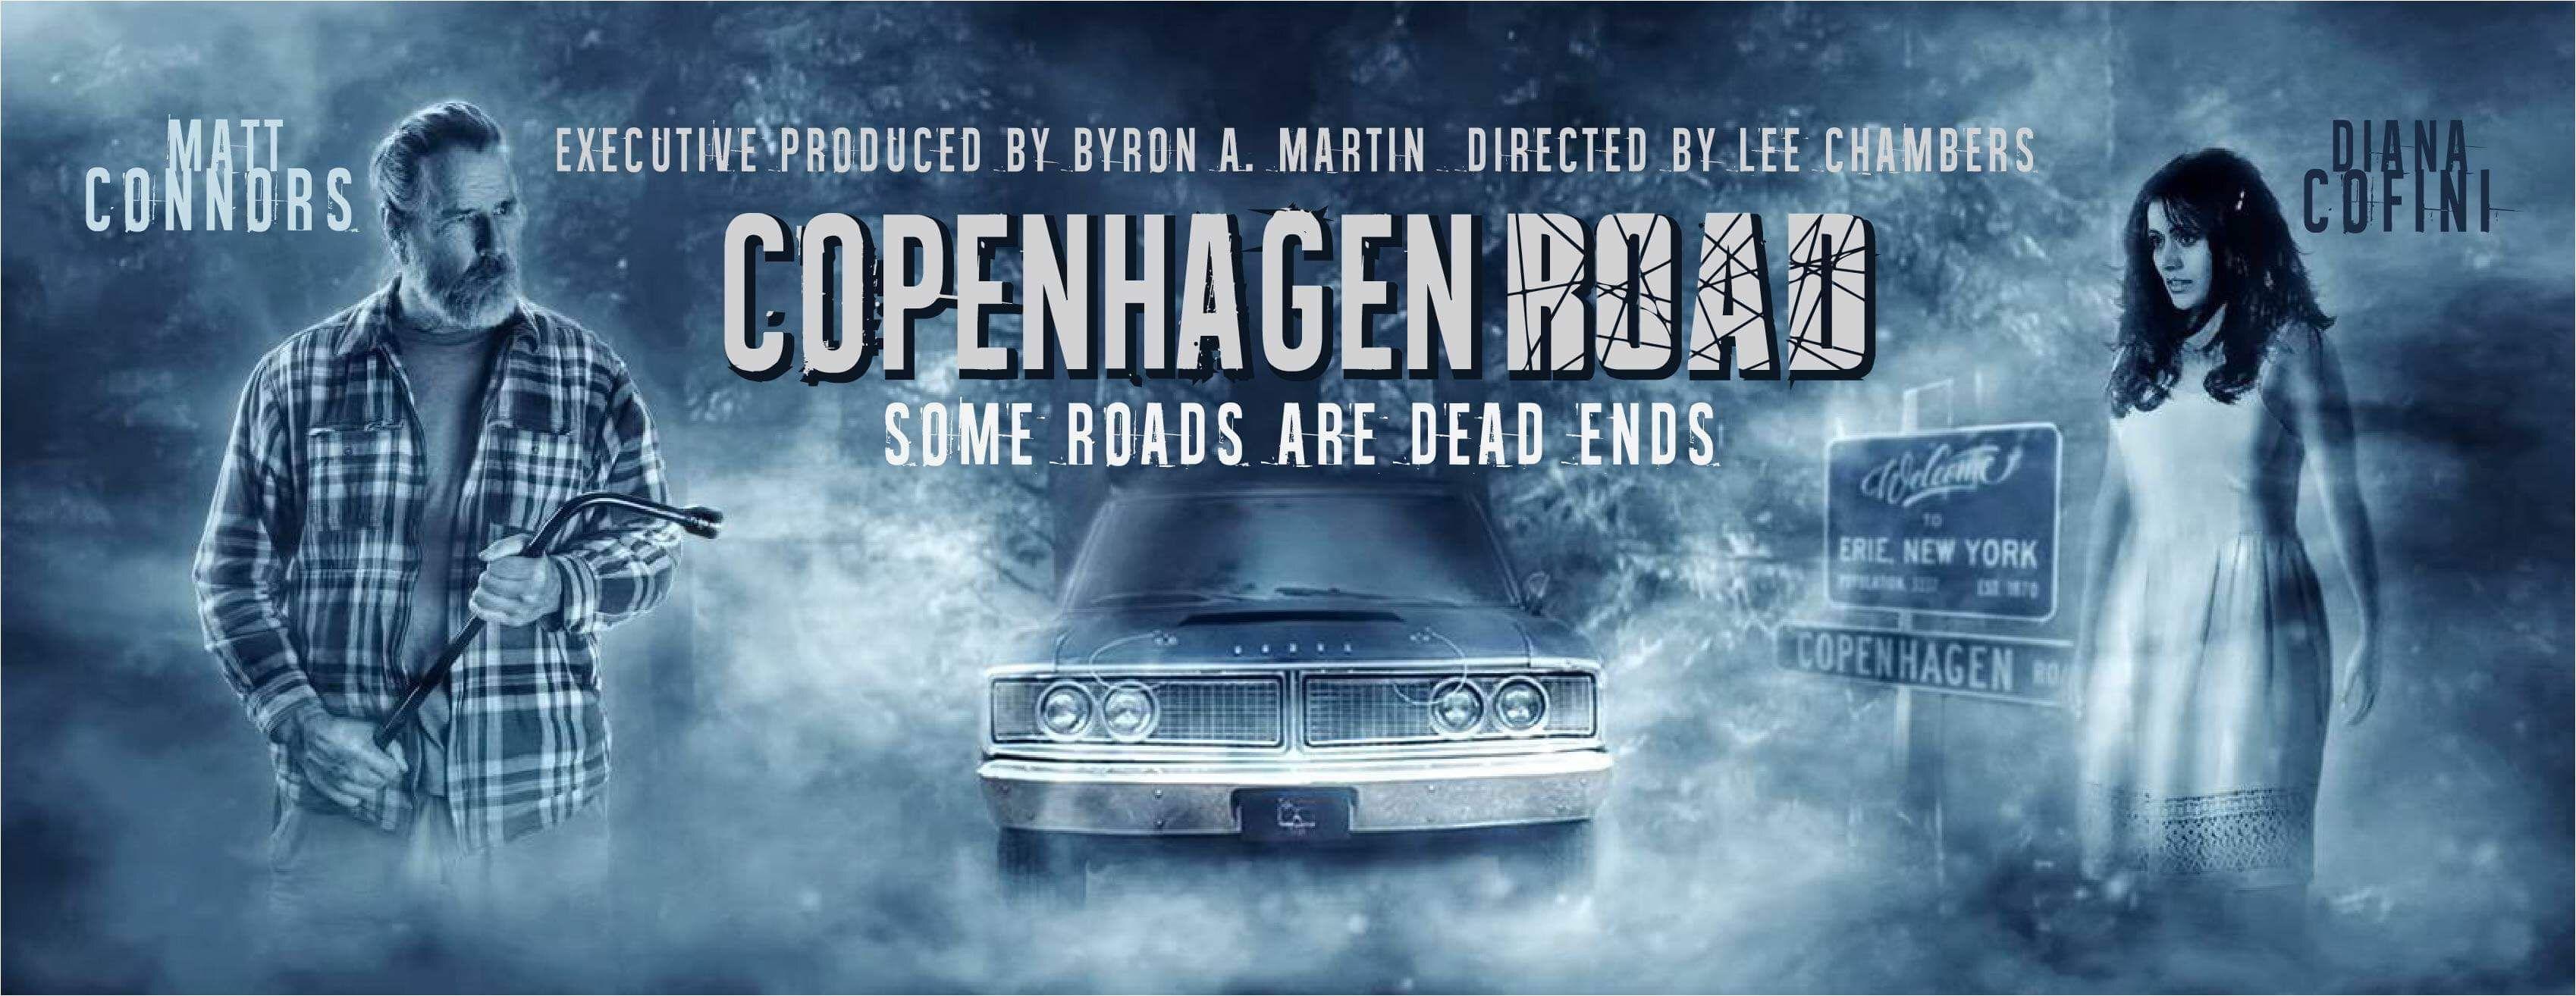 Copenhagen Road (2019) Copenhagen, Byron, Road